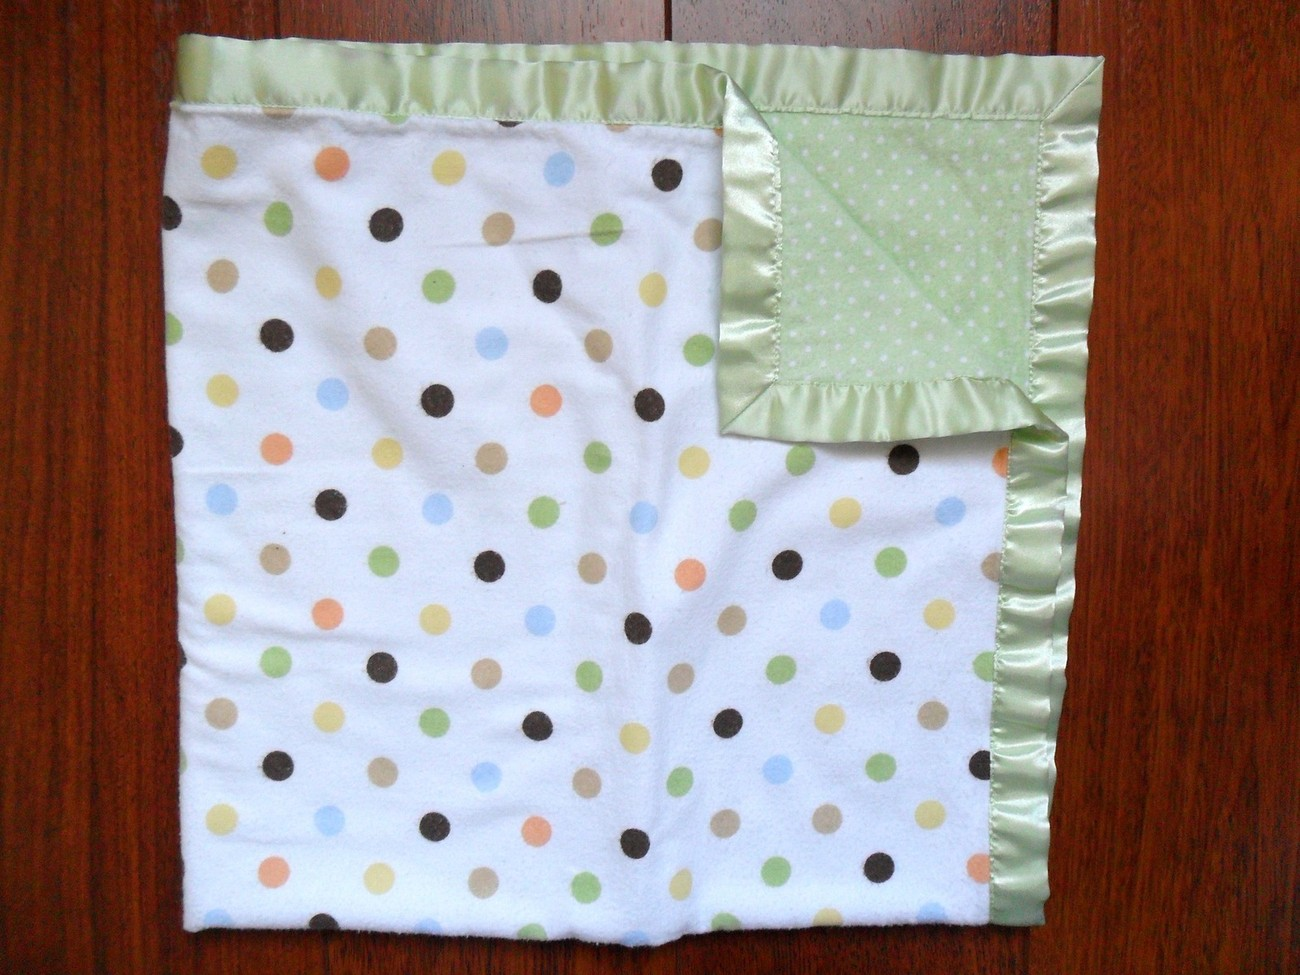 JUST BORN Baby Blanket green satin polka dot security Blanket lovey Brown orange